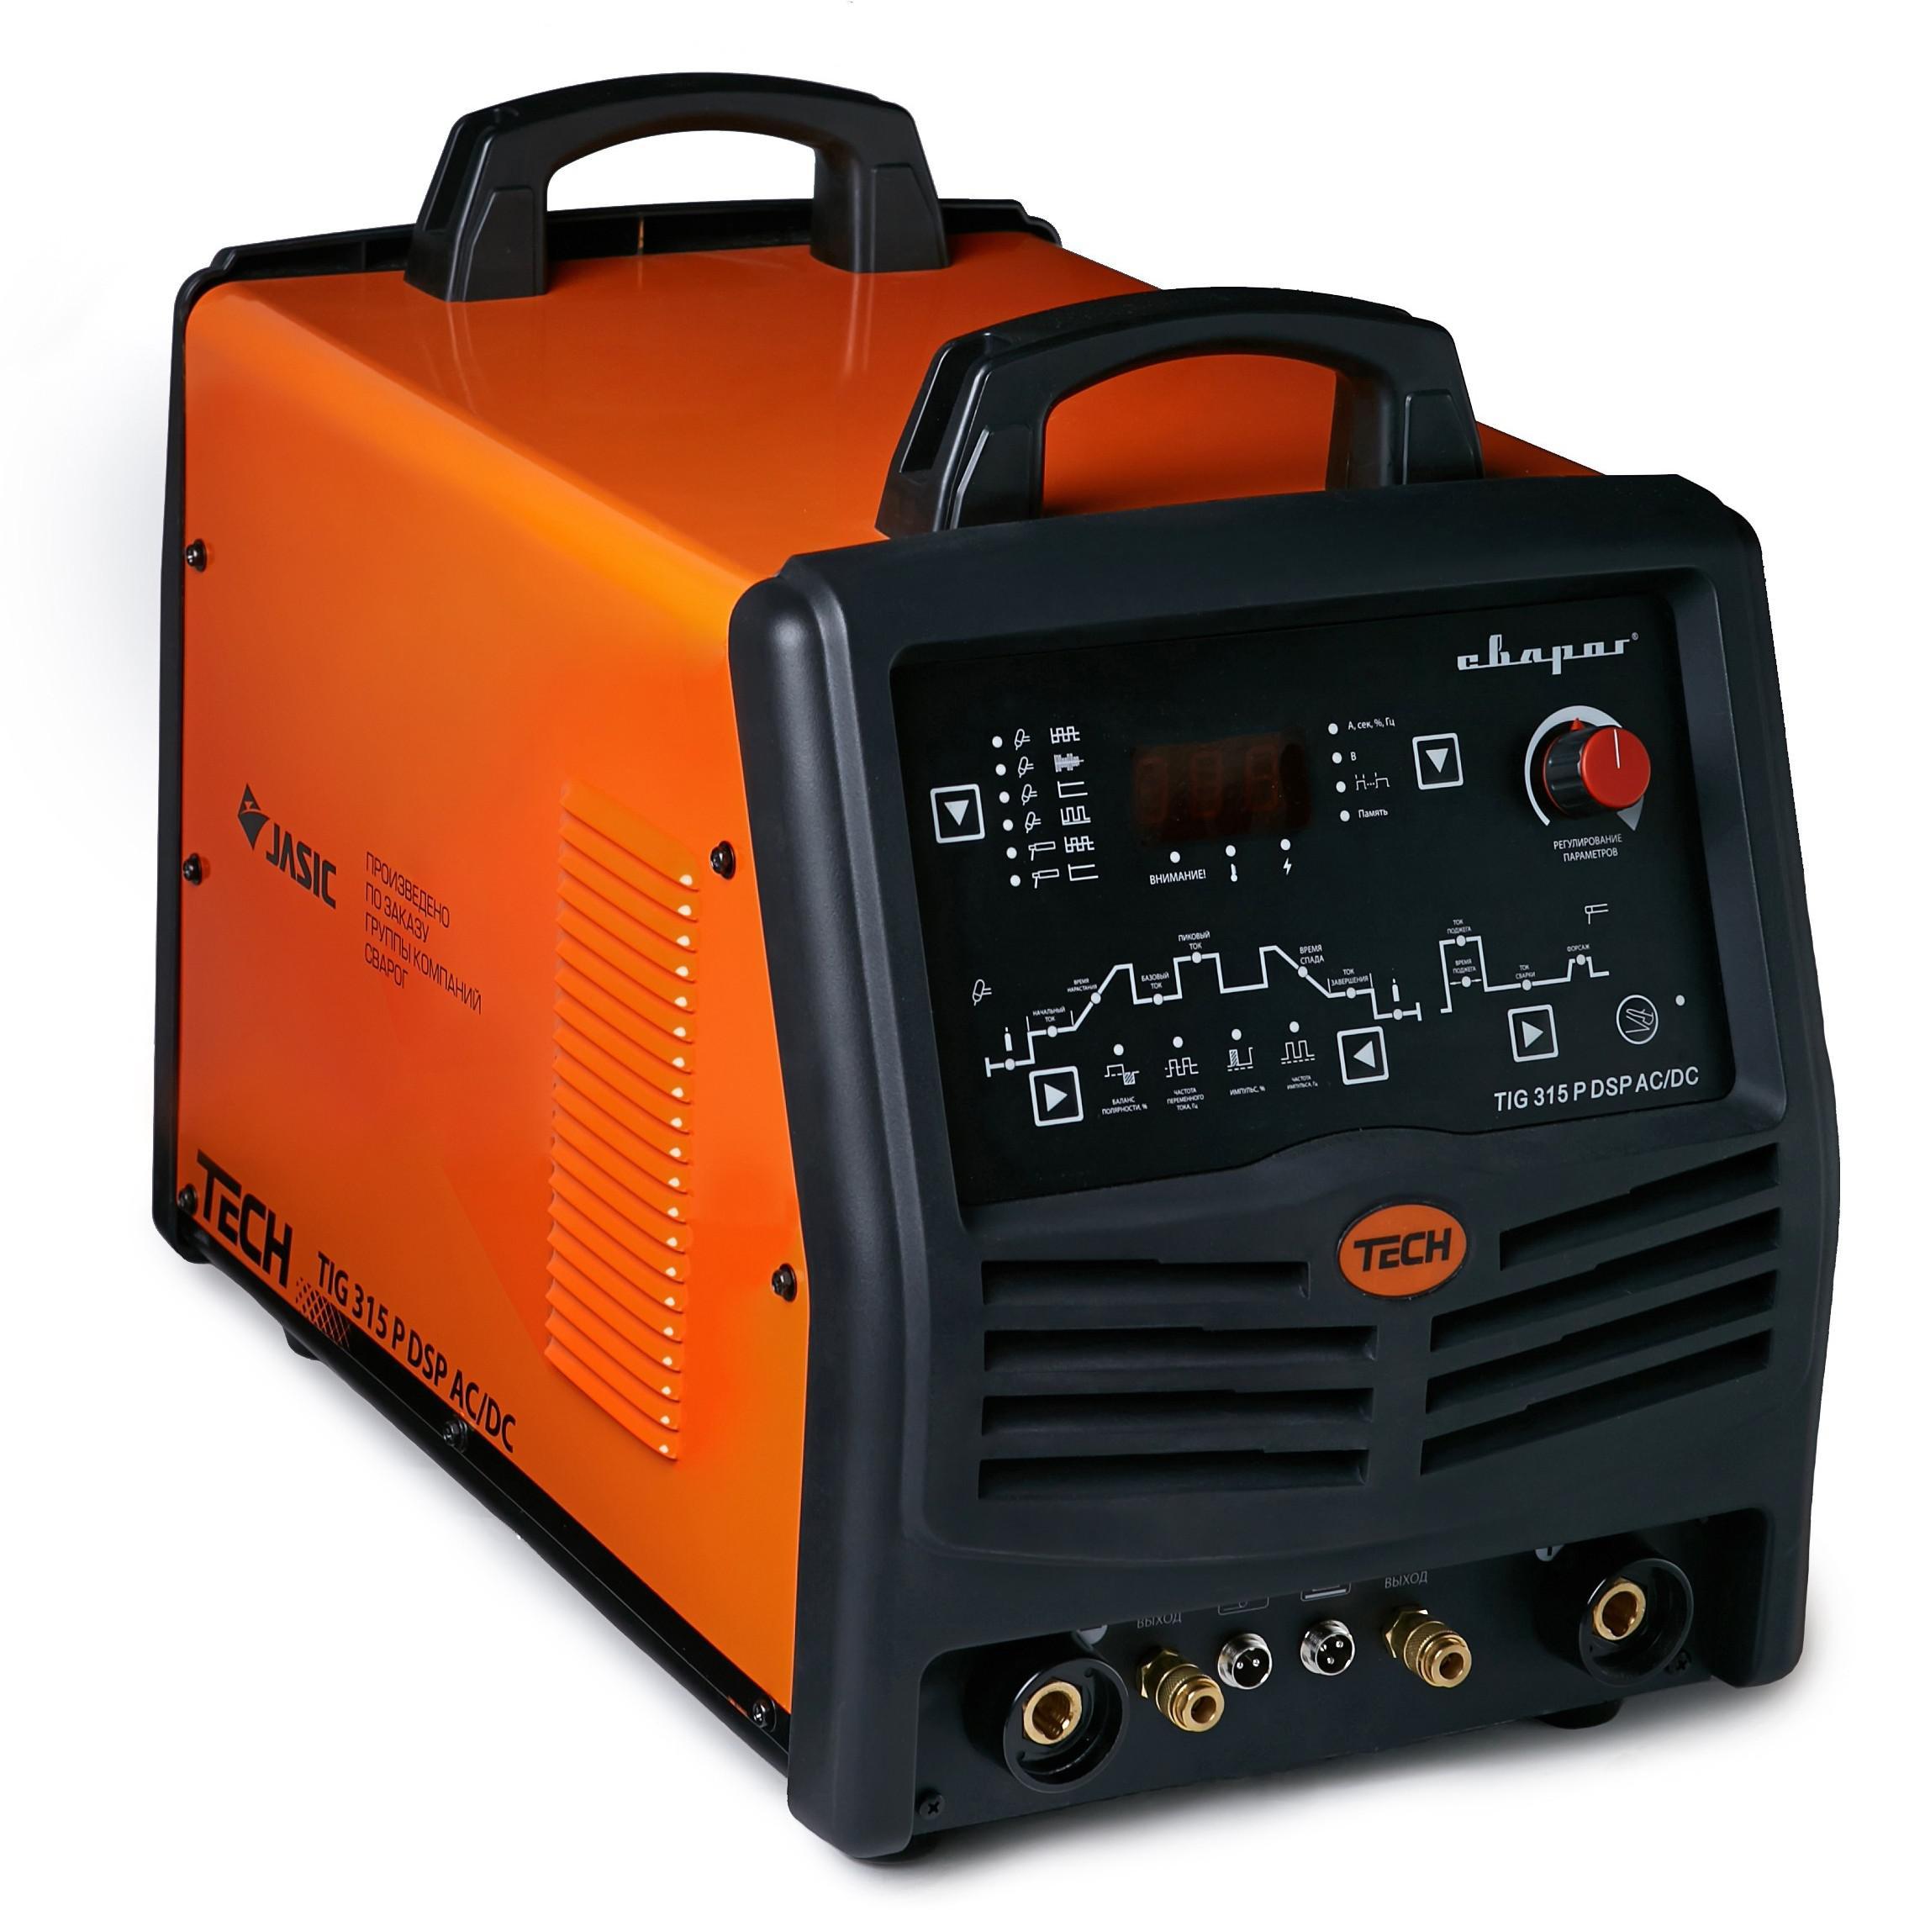 Сварочный аппарат СВАРОГ Tech tig 315 p ac/dc dsp (e106) сварочный аппарат сварог pro tig 200 p dsp w212